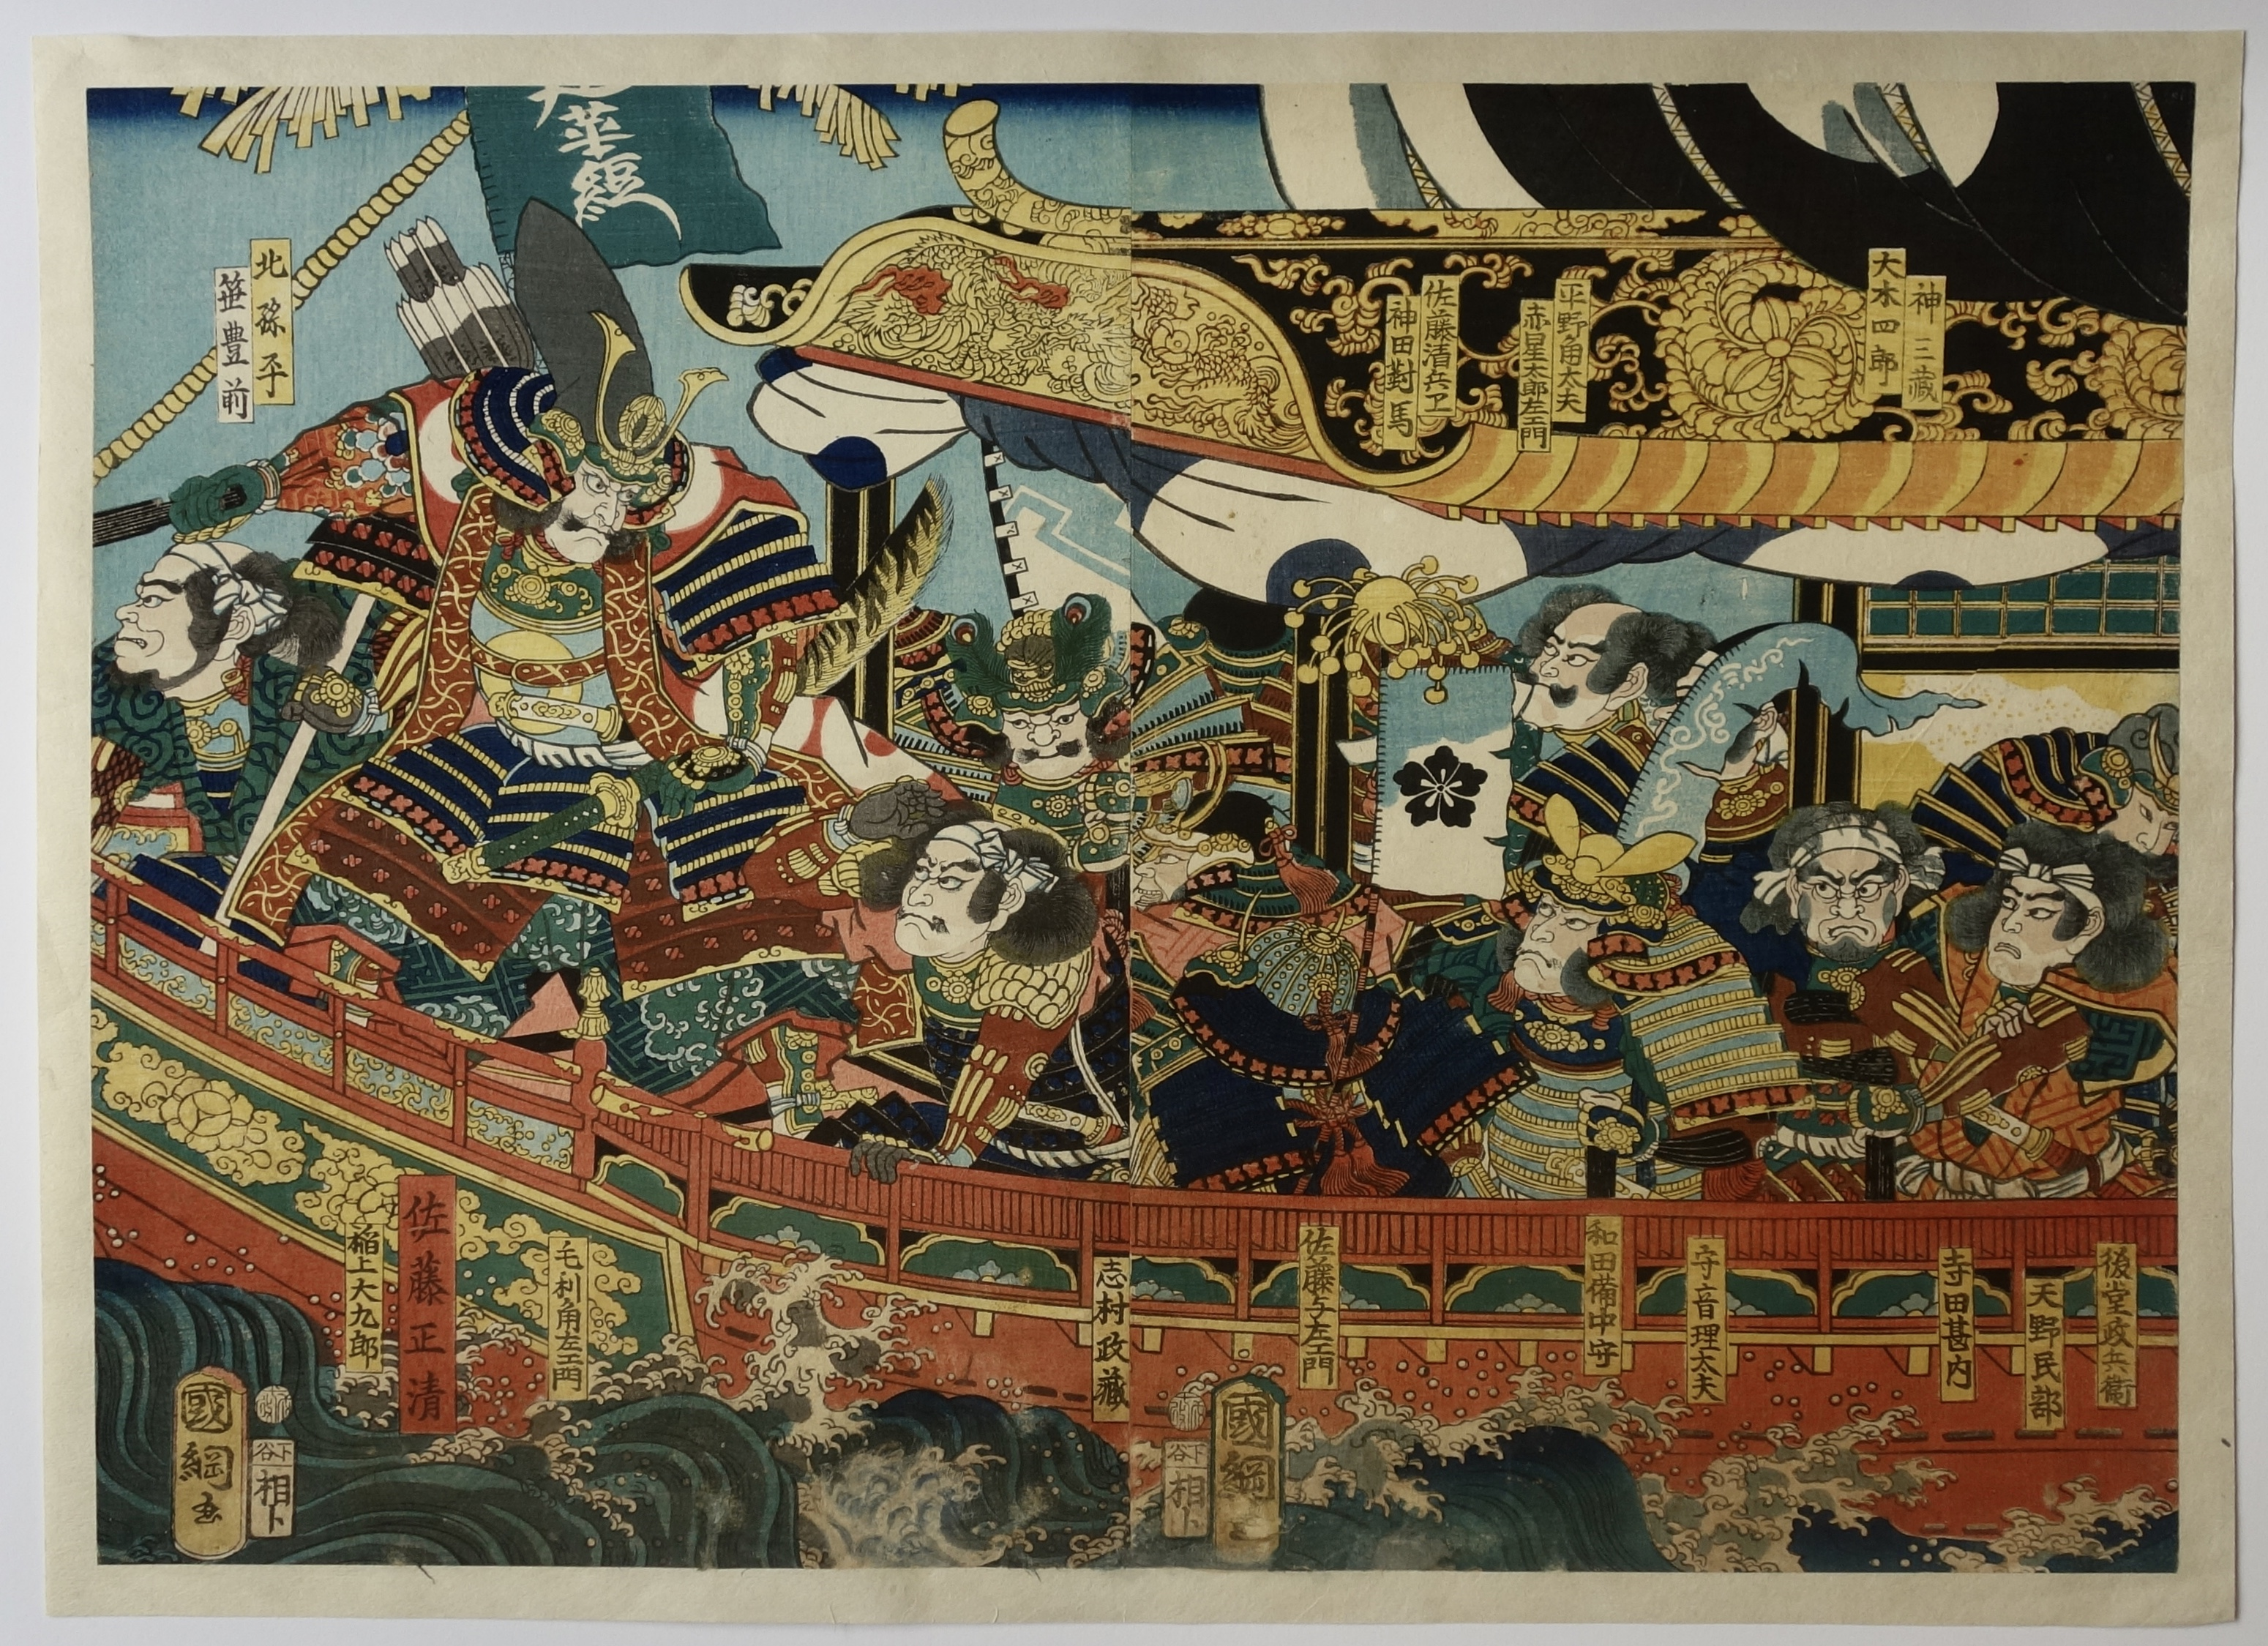 KUNITERU Utagawa II, dit aussi Kunitsuna II